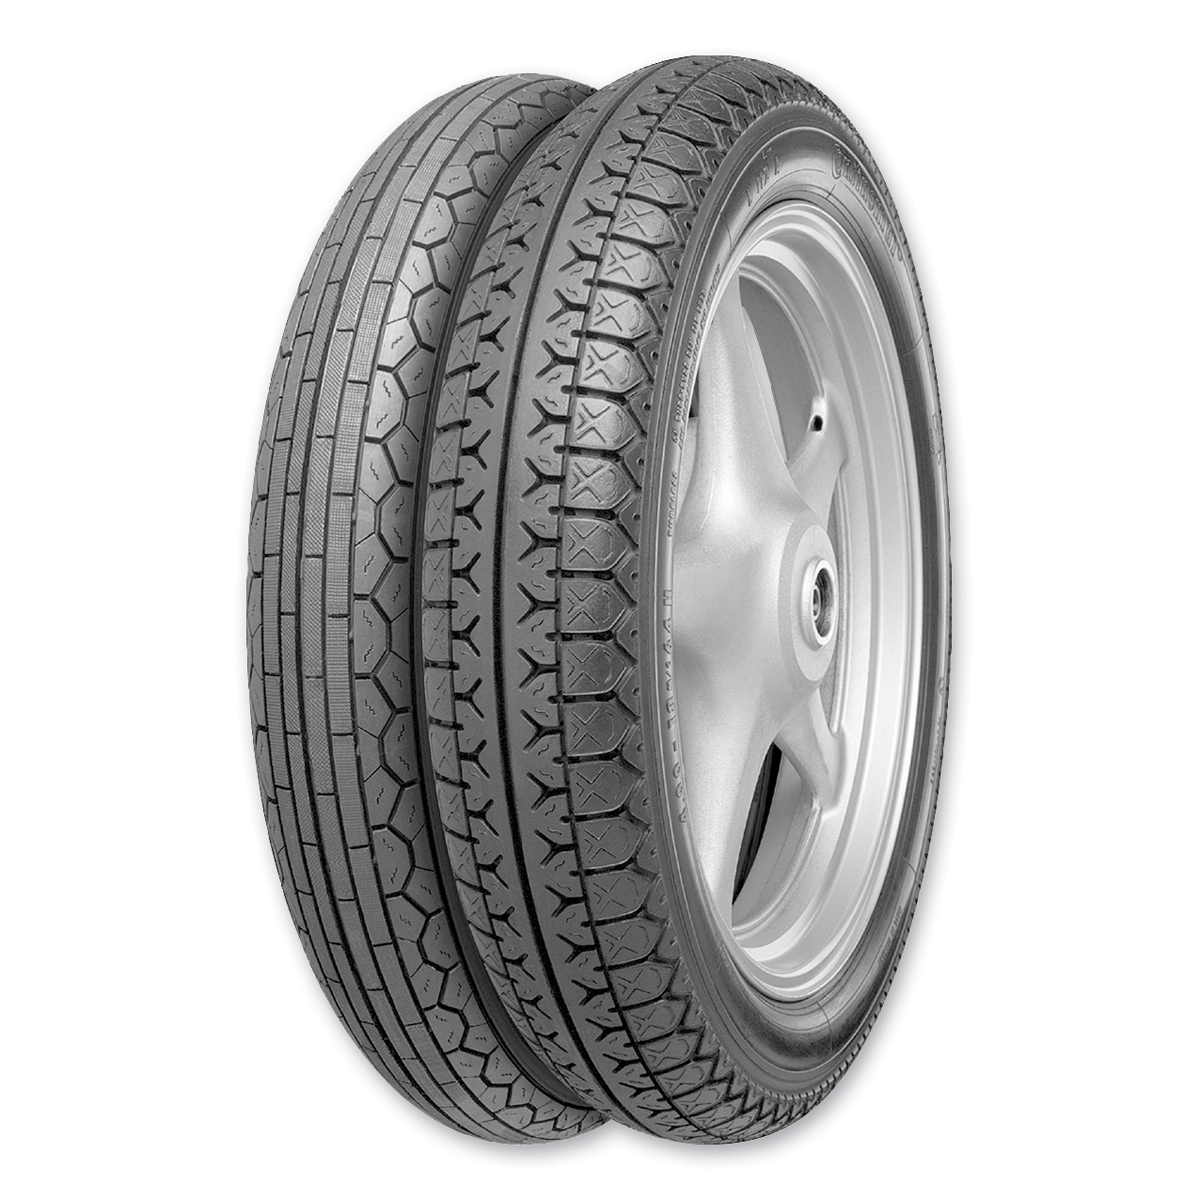 Continental Twins Classic 4.00H18 K112 Rear Tire